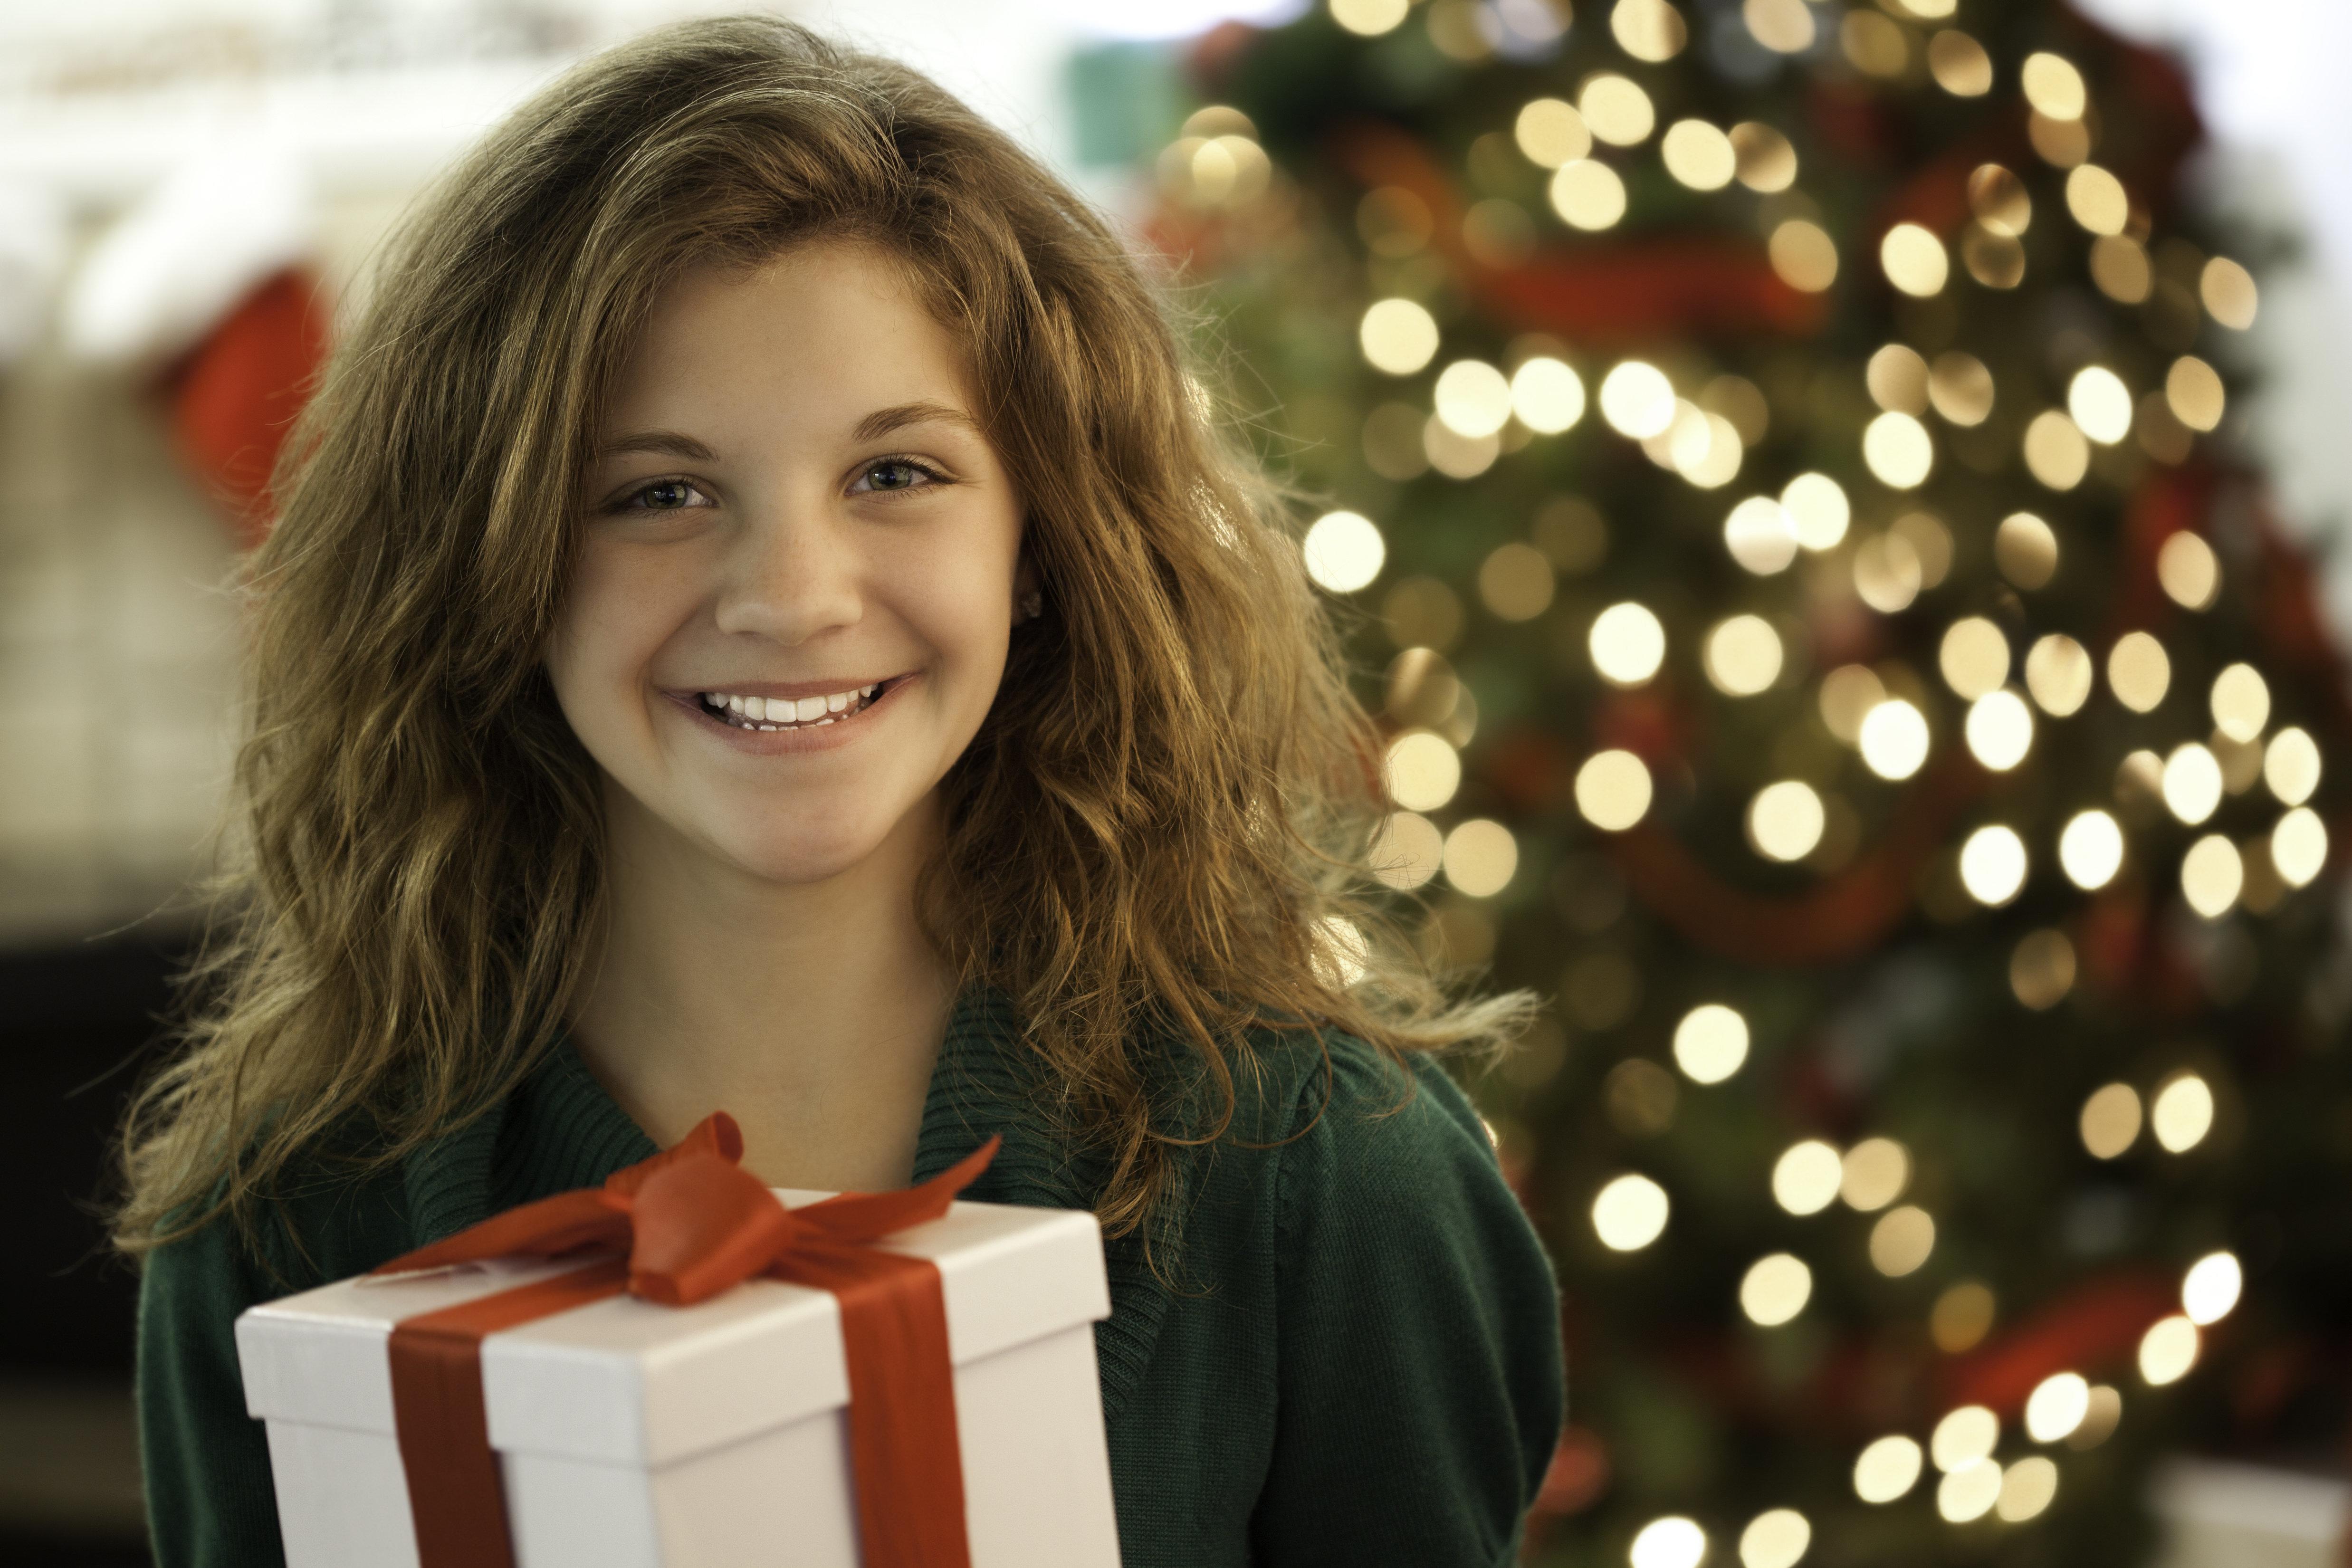 christmas-gifts-teen-girls-university-hot-girl-sex